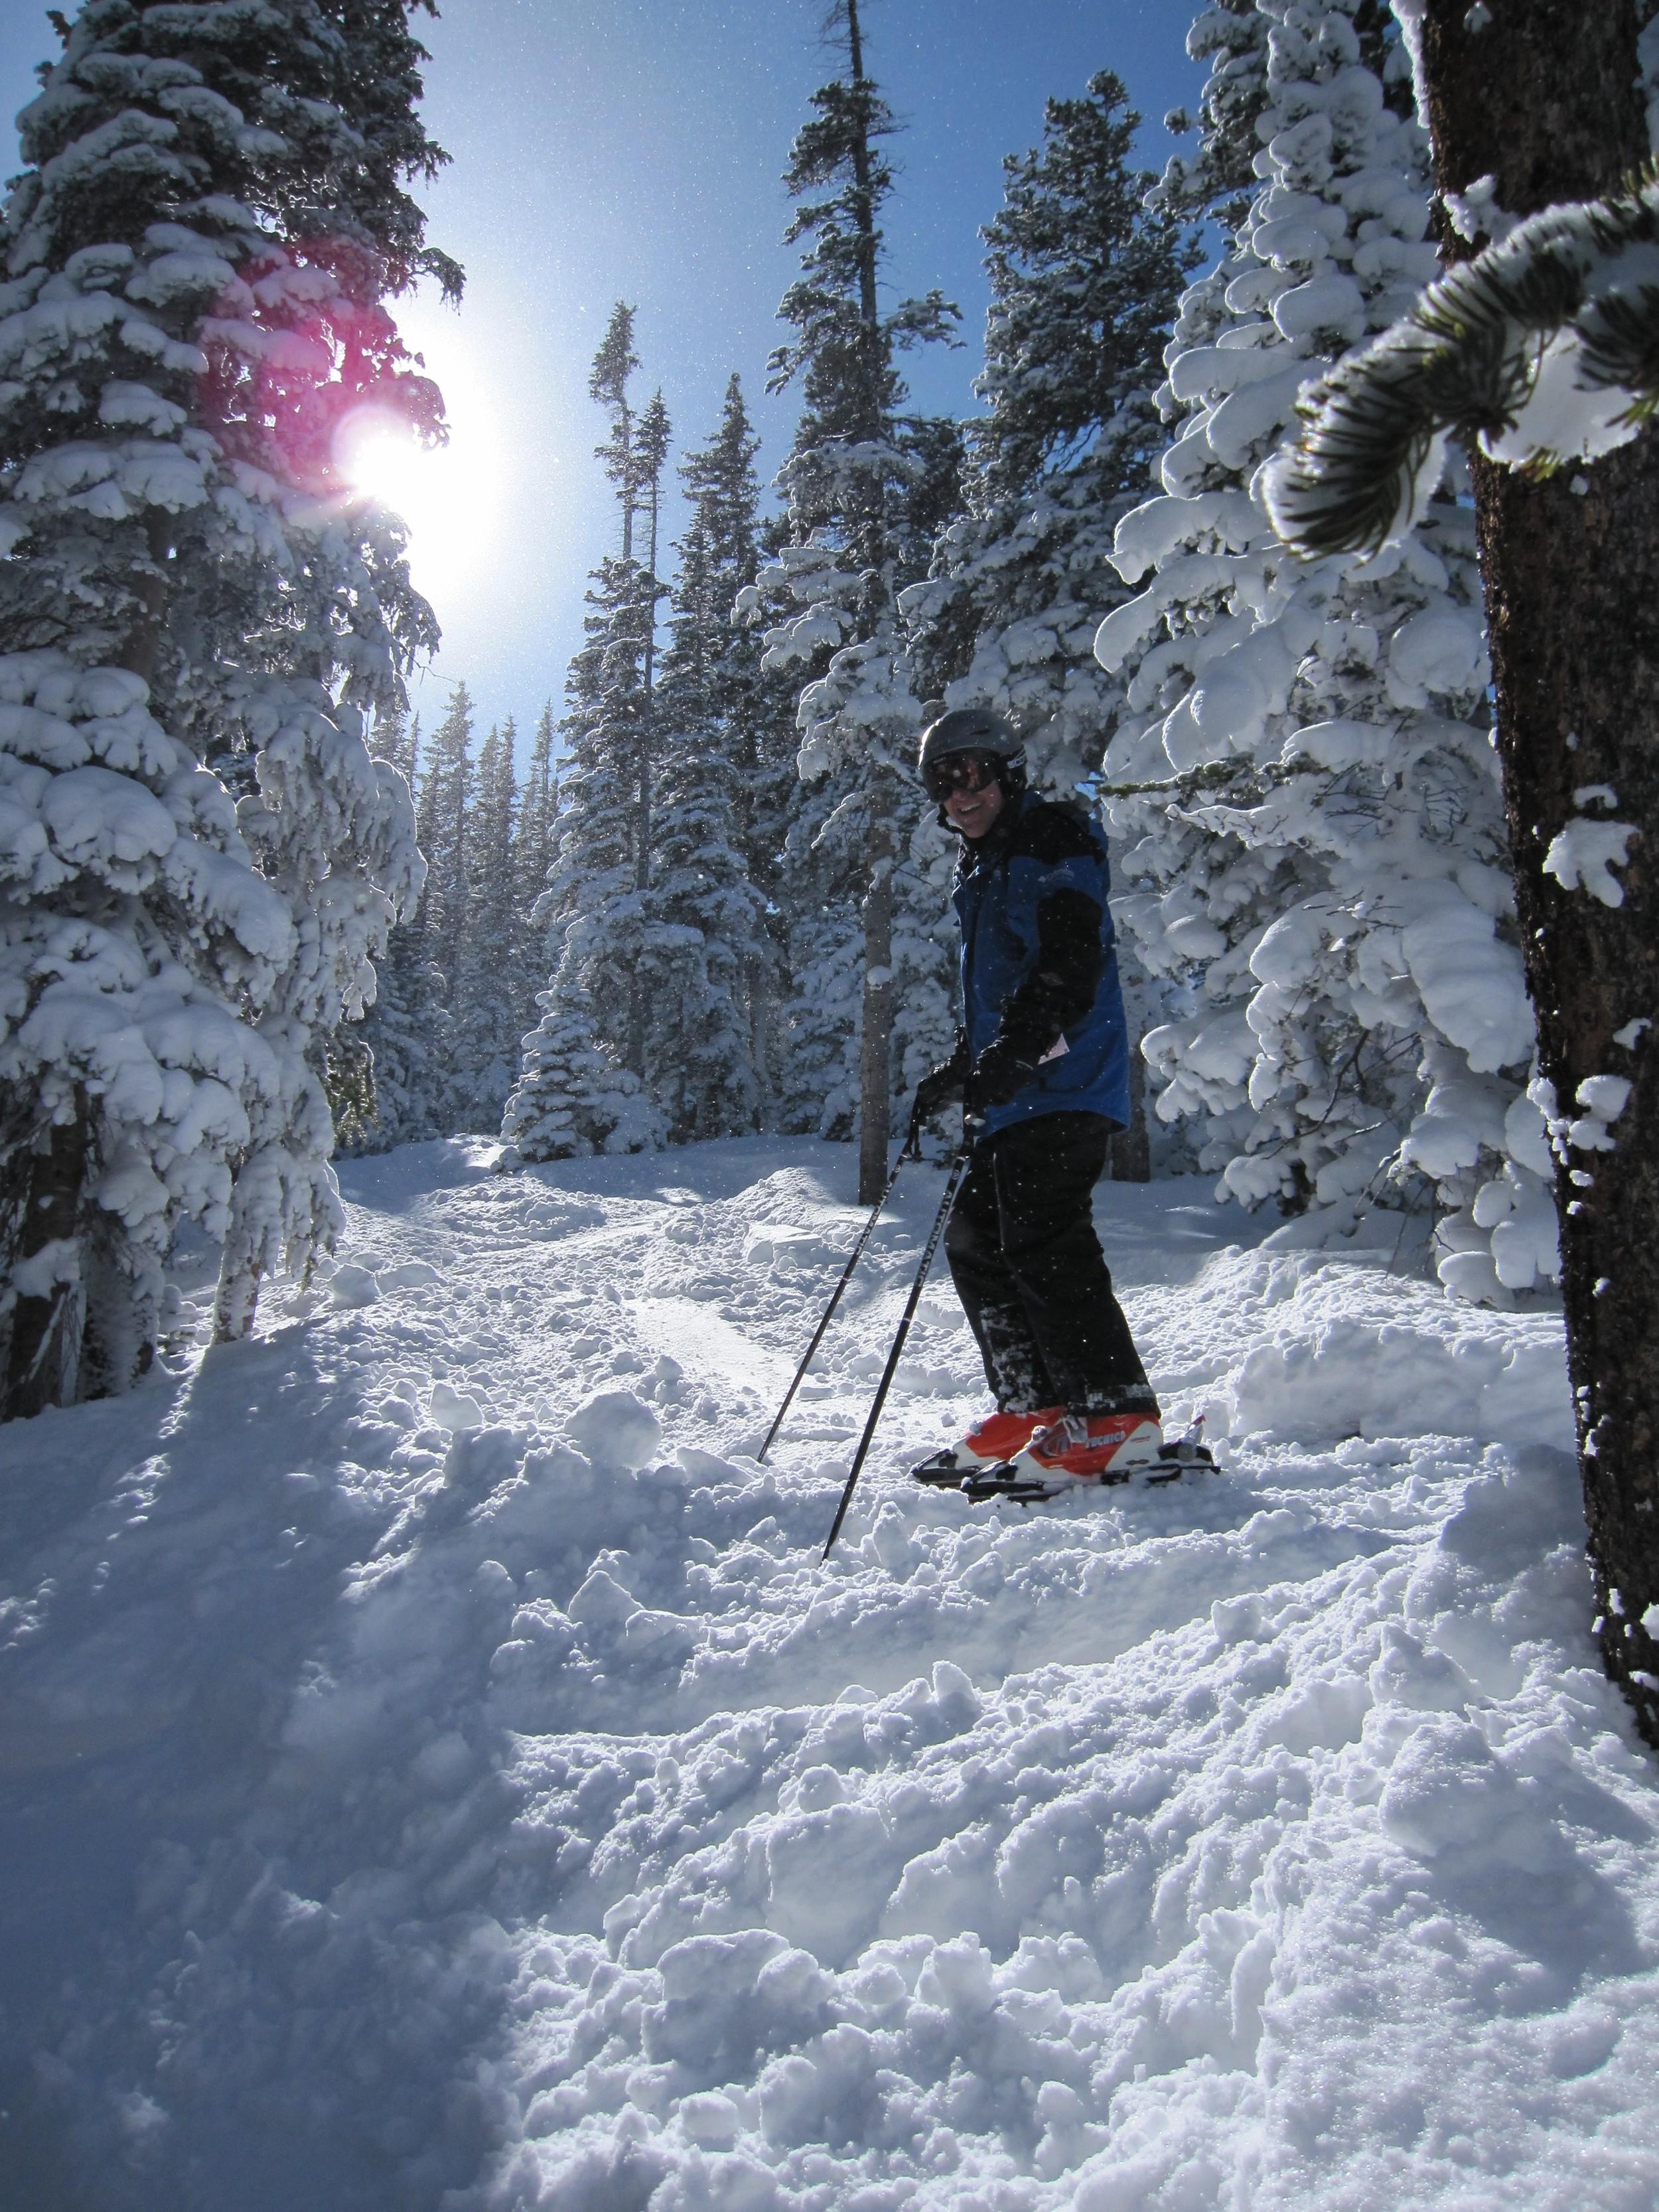 Skiing at Eldori Ski Resort - a short hour's drive from Estes!